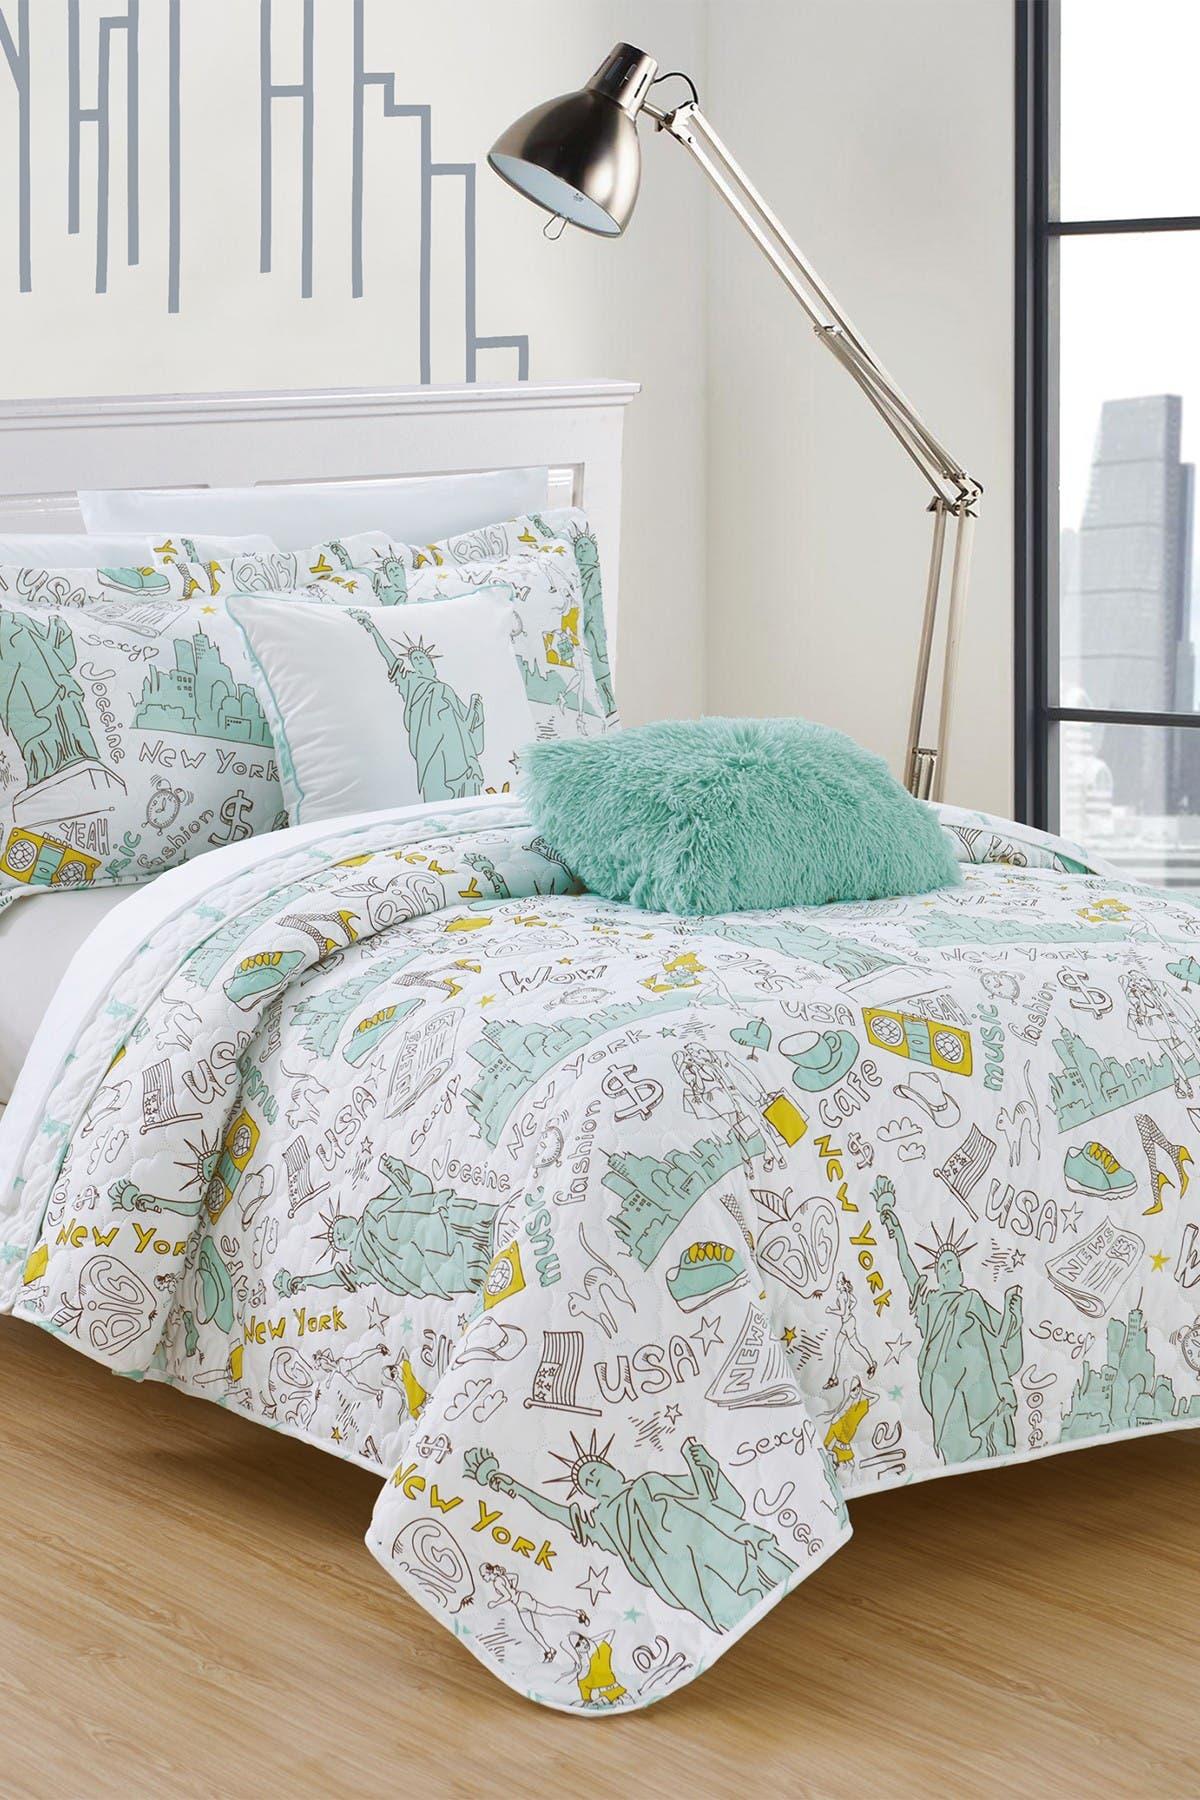 Image of Chic Home Bedding Full Fulton Reversible New York Theme Quilt Set - Green